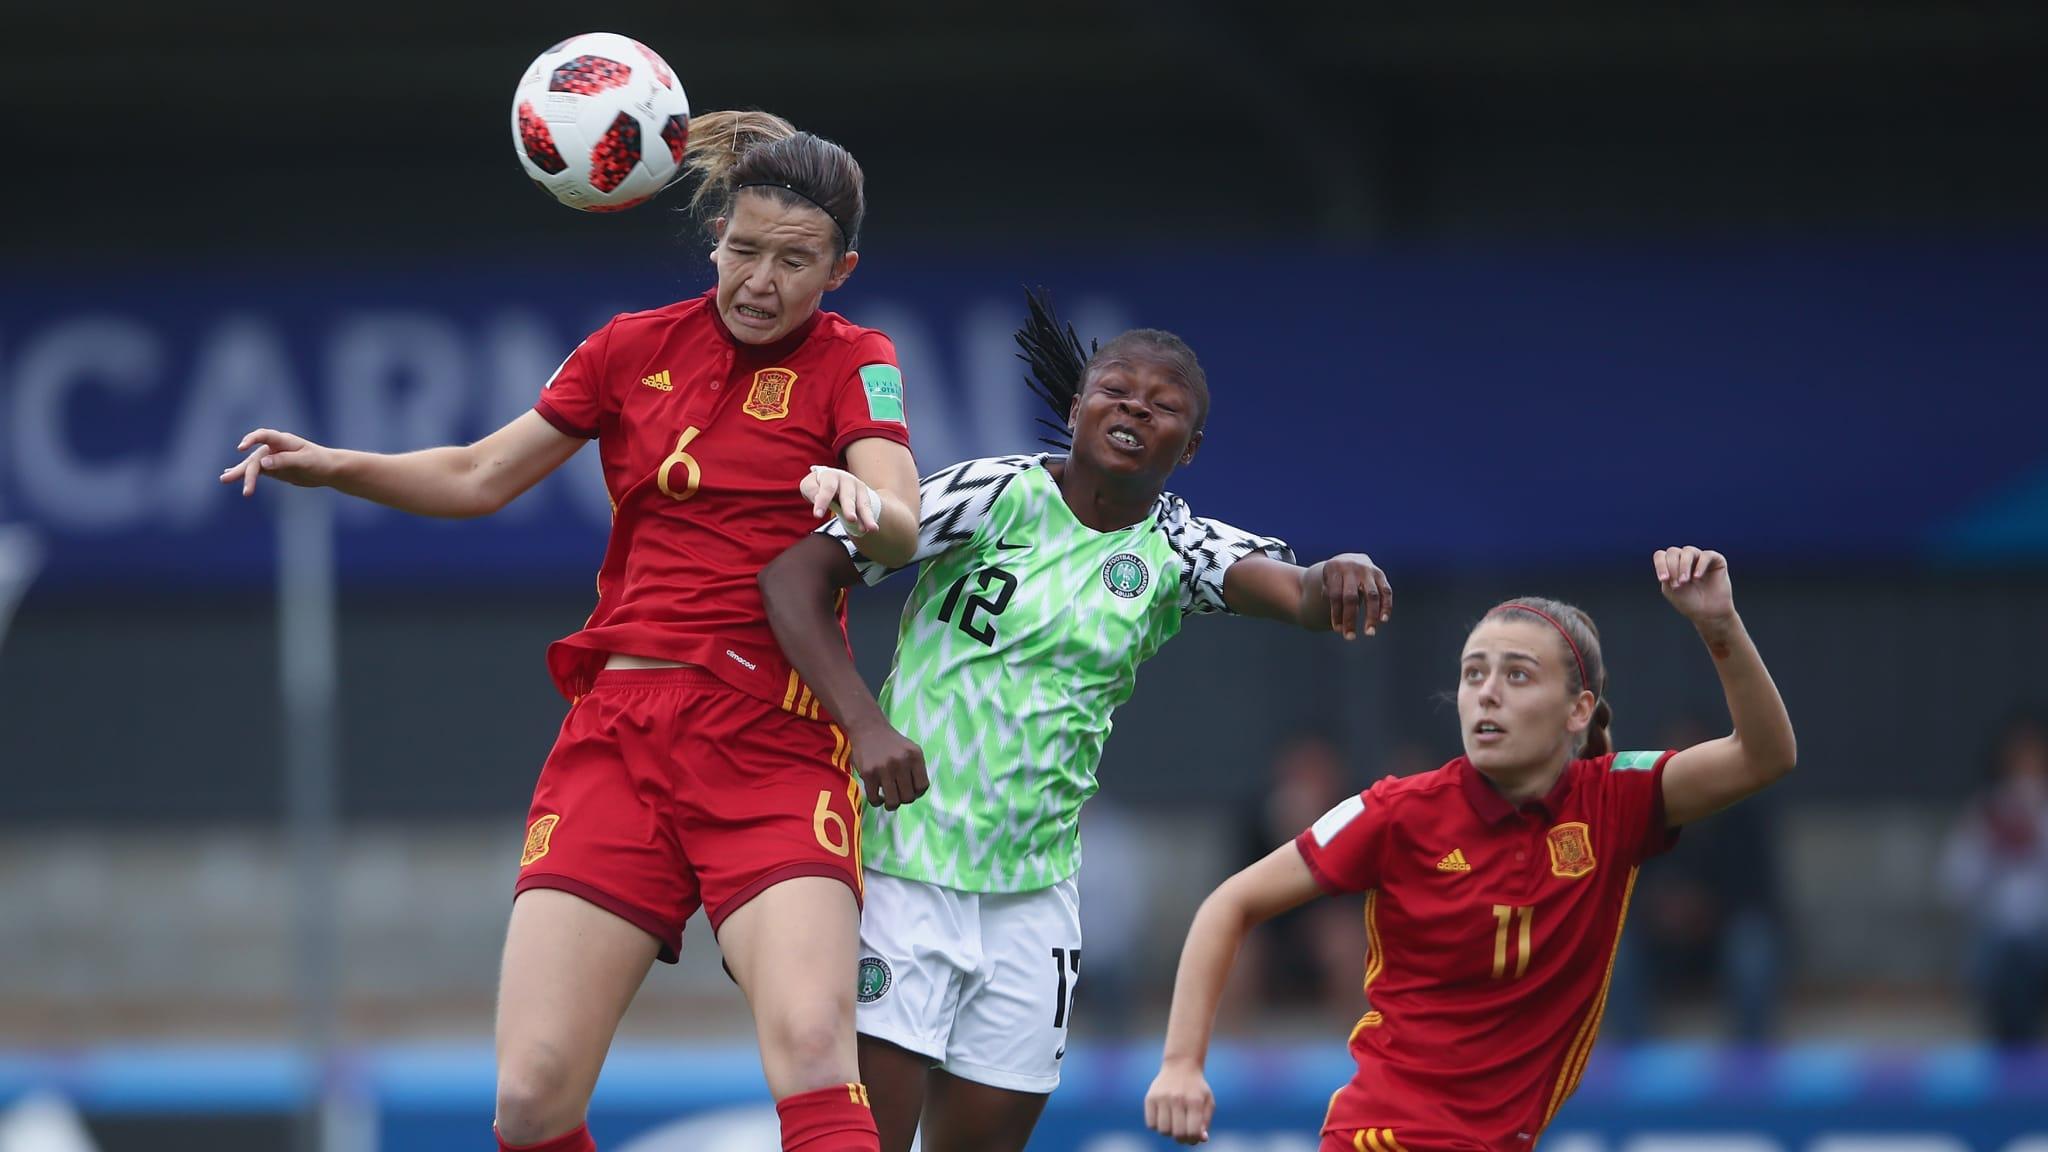 FIFA U-20 WW/Cup: Spain Eliminate Gallant Falconets To Reach Semis